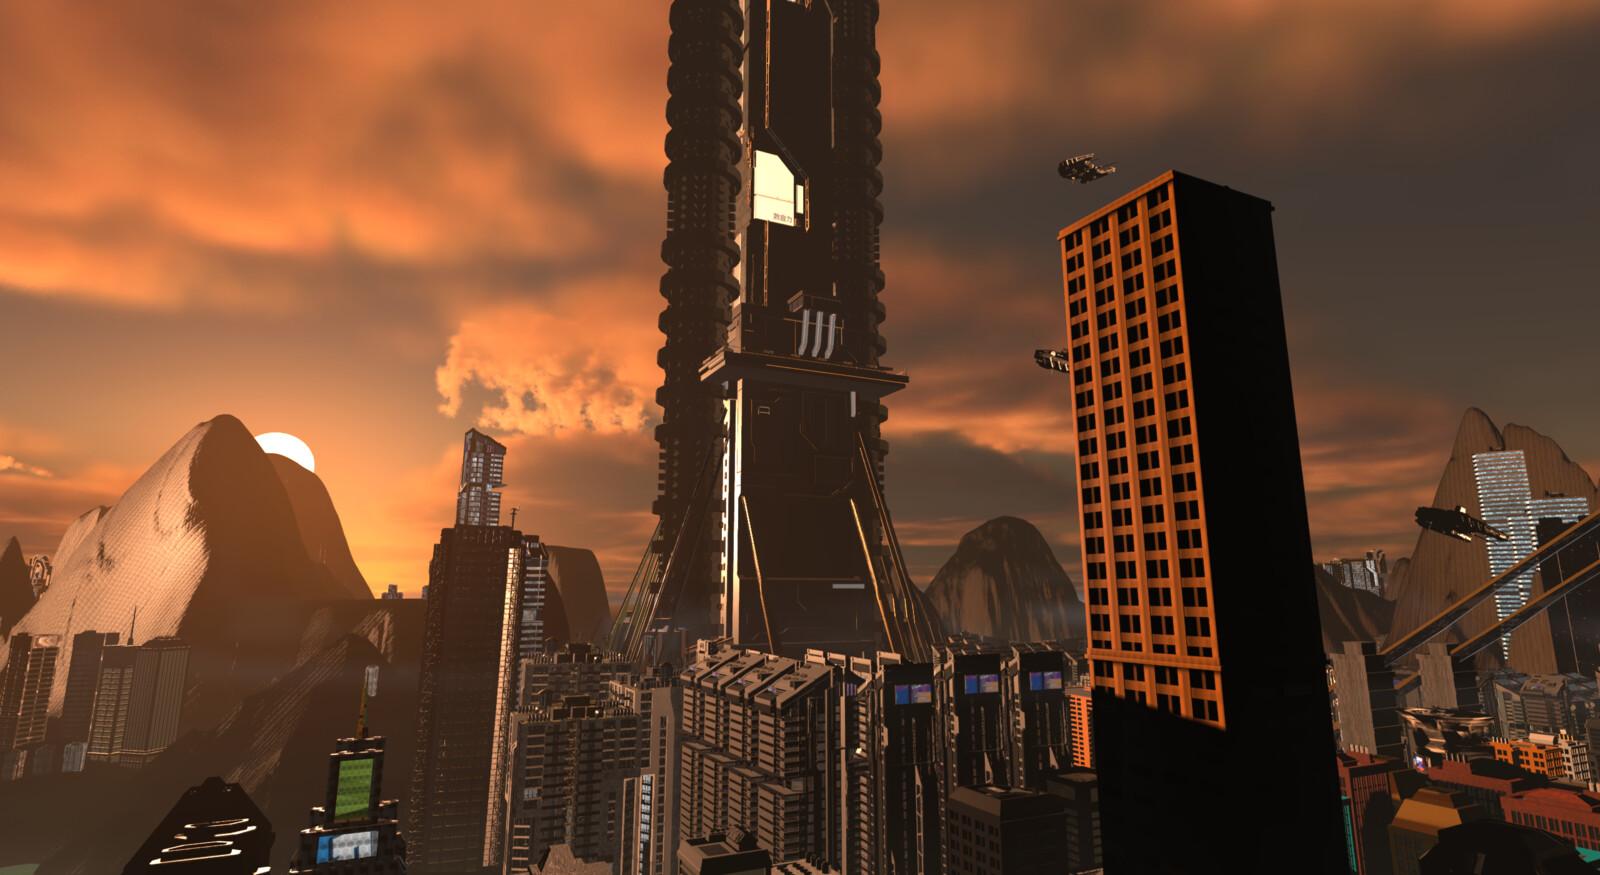 #unrealengine  #ue5 #gamedev #ue4 #VirtualProduction #bodyelectricmovie